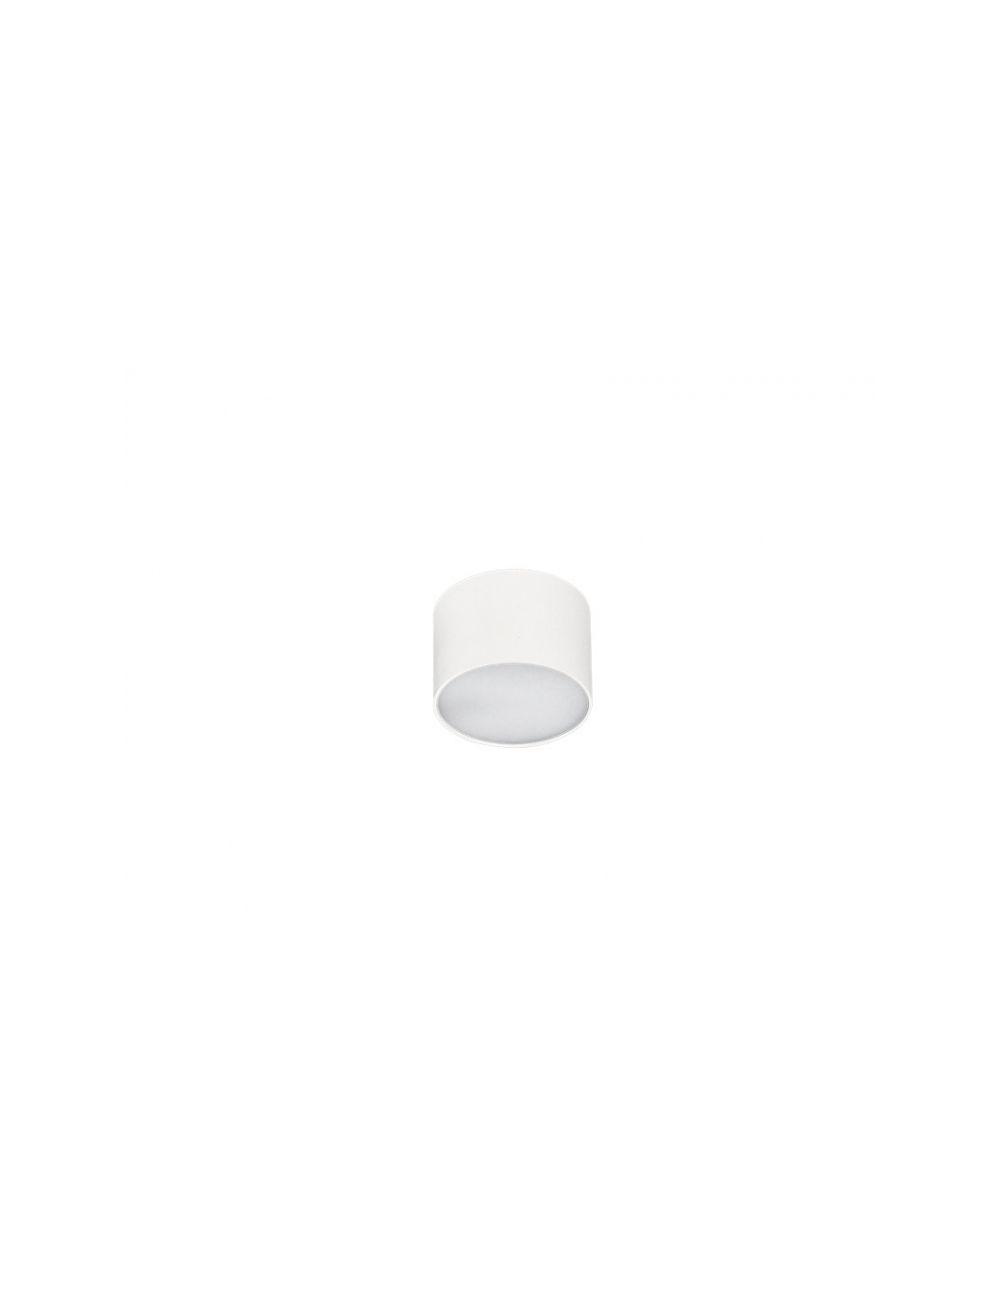 Plafon ledowy tubka Monza R8 4000K biała Azzardo SHR604000-5-WH